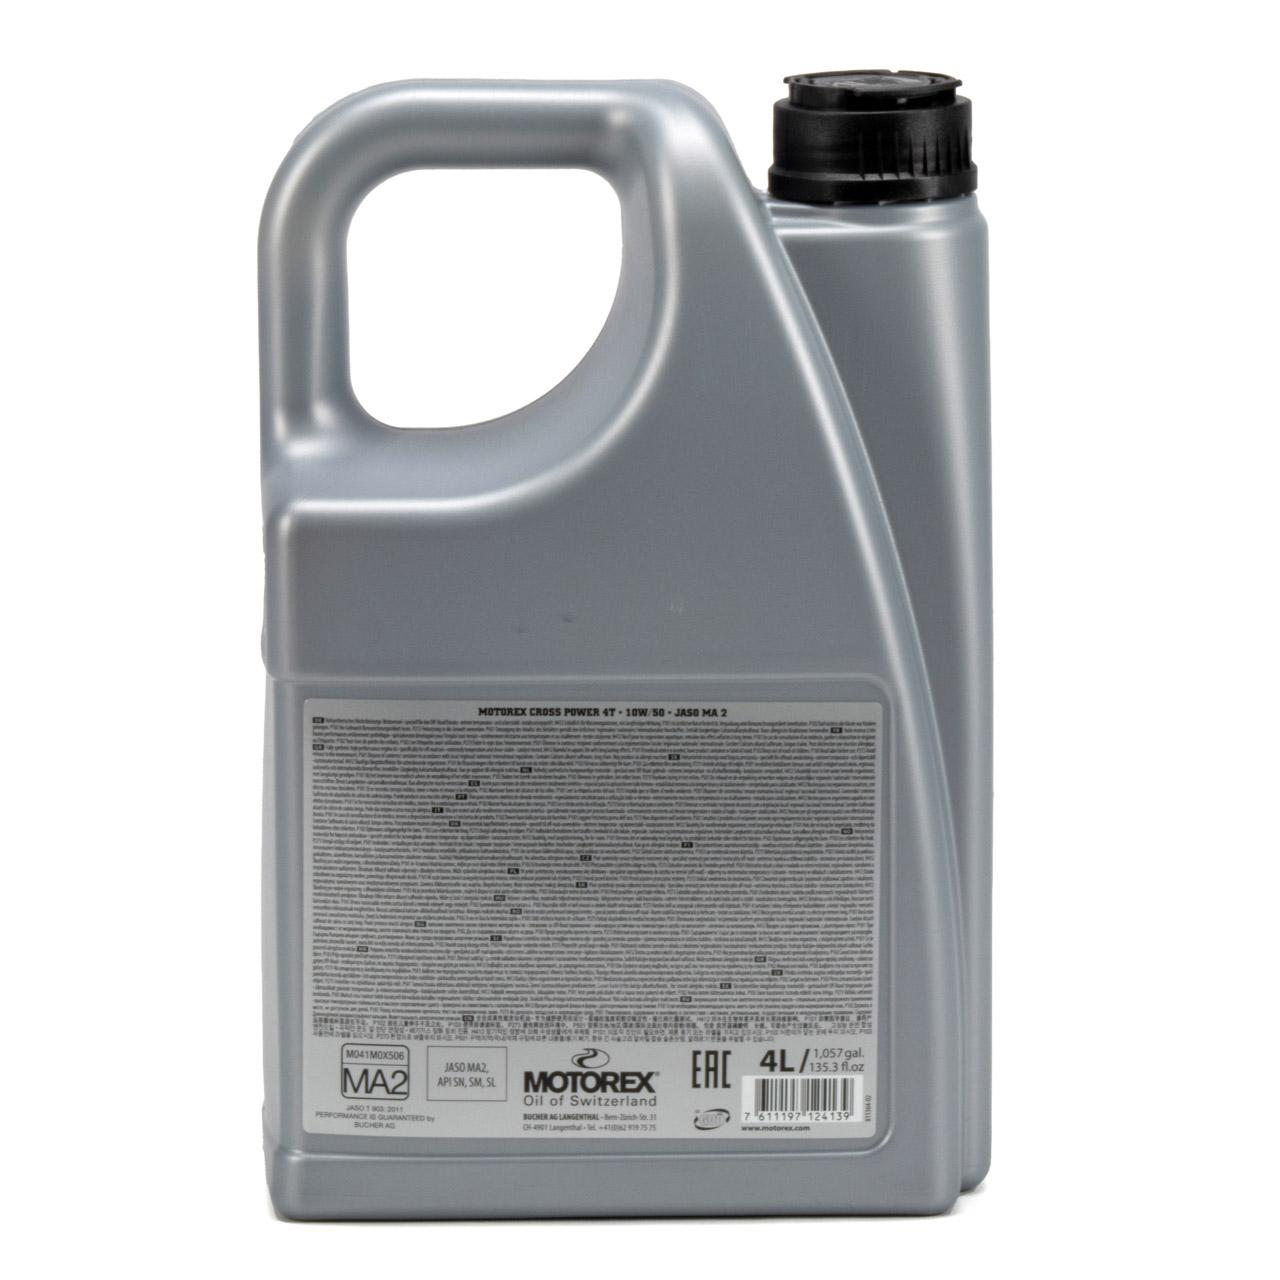 MOTOREX Cross Power 4T Motoröl Öl 10W50 JASO MA2 API SN/SM/SL - 4L 4 Liter